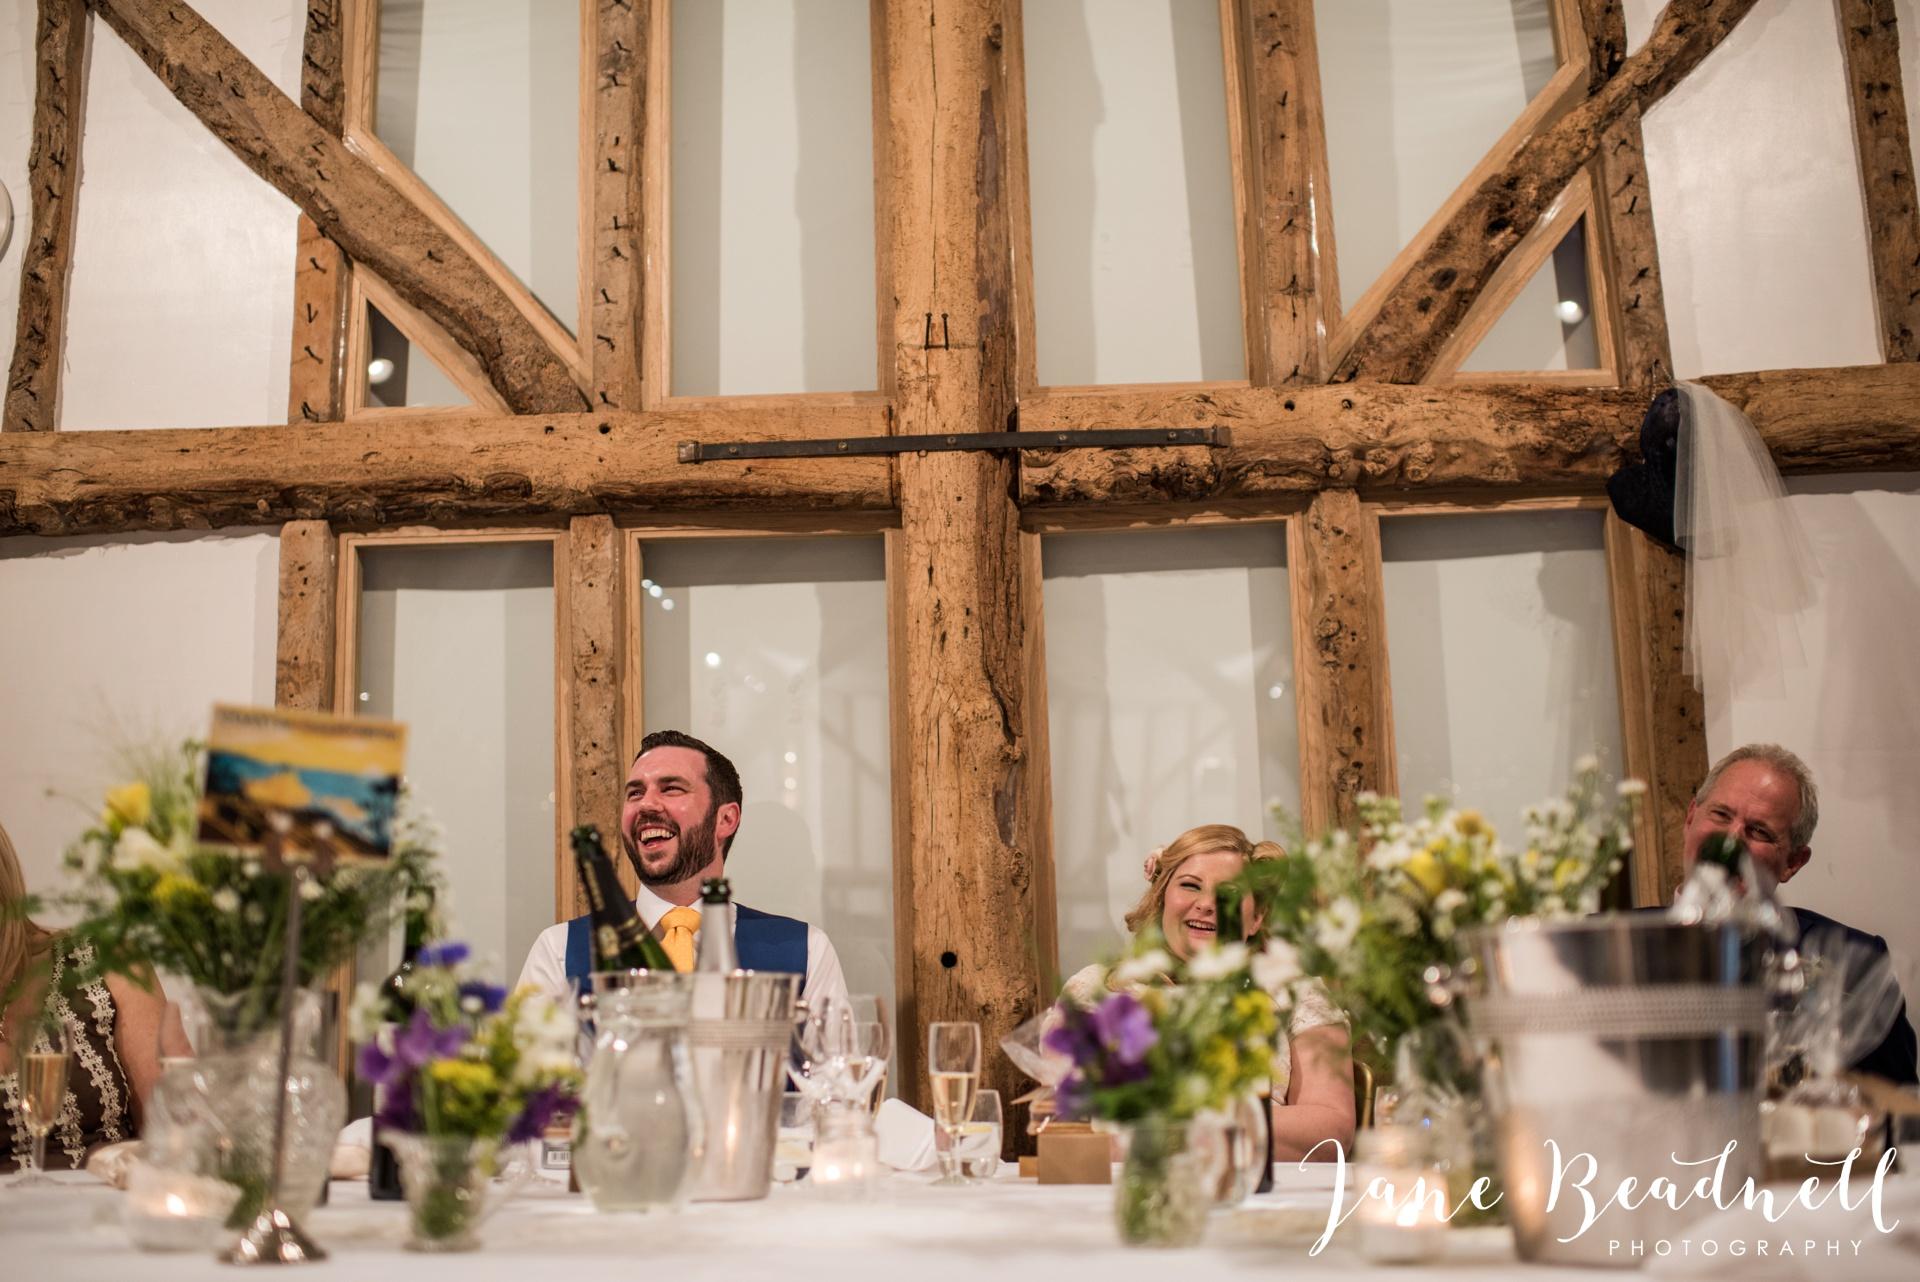 South Farm Wedding photography Hertfordshire by Jane Beadnell Photography fine art wedding photographer_0206